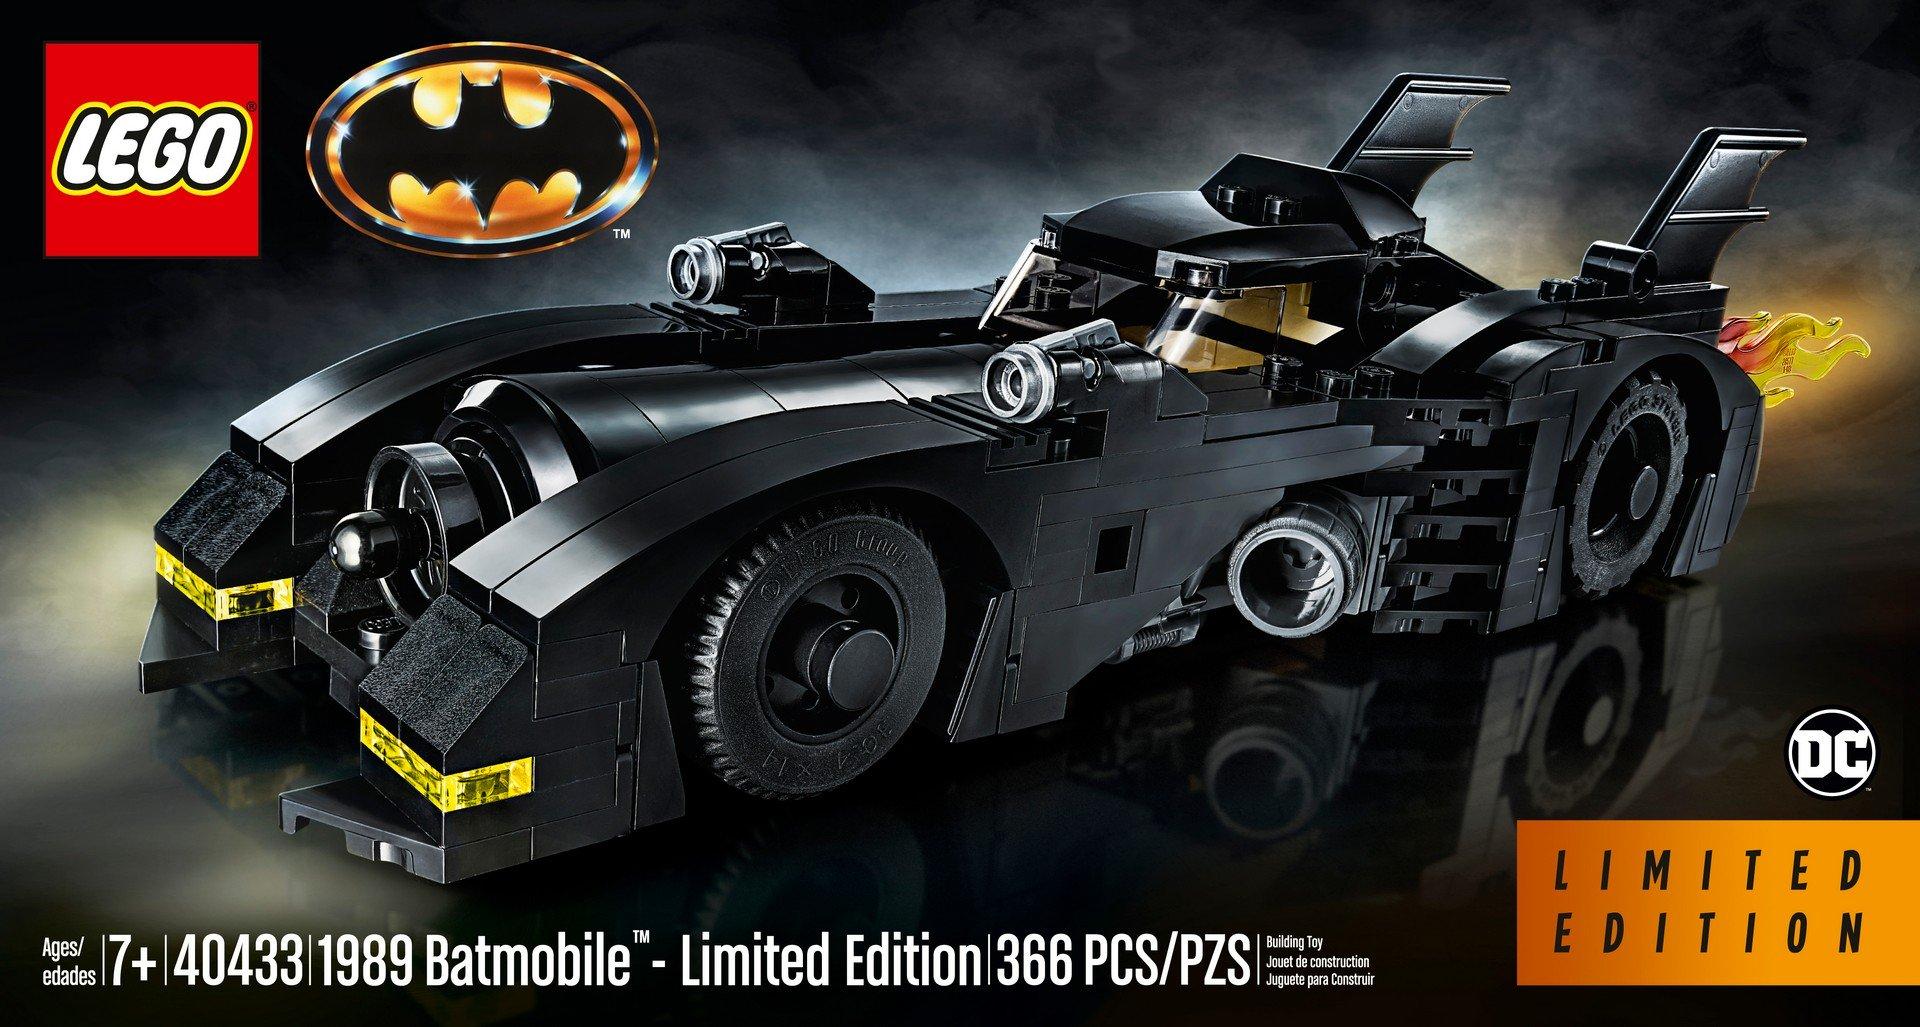 Lego-Batmobile-kit-1989-13